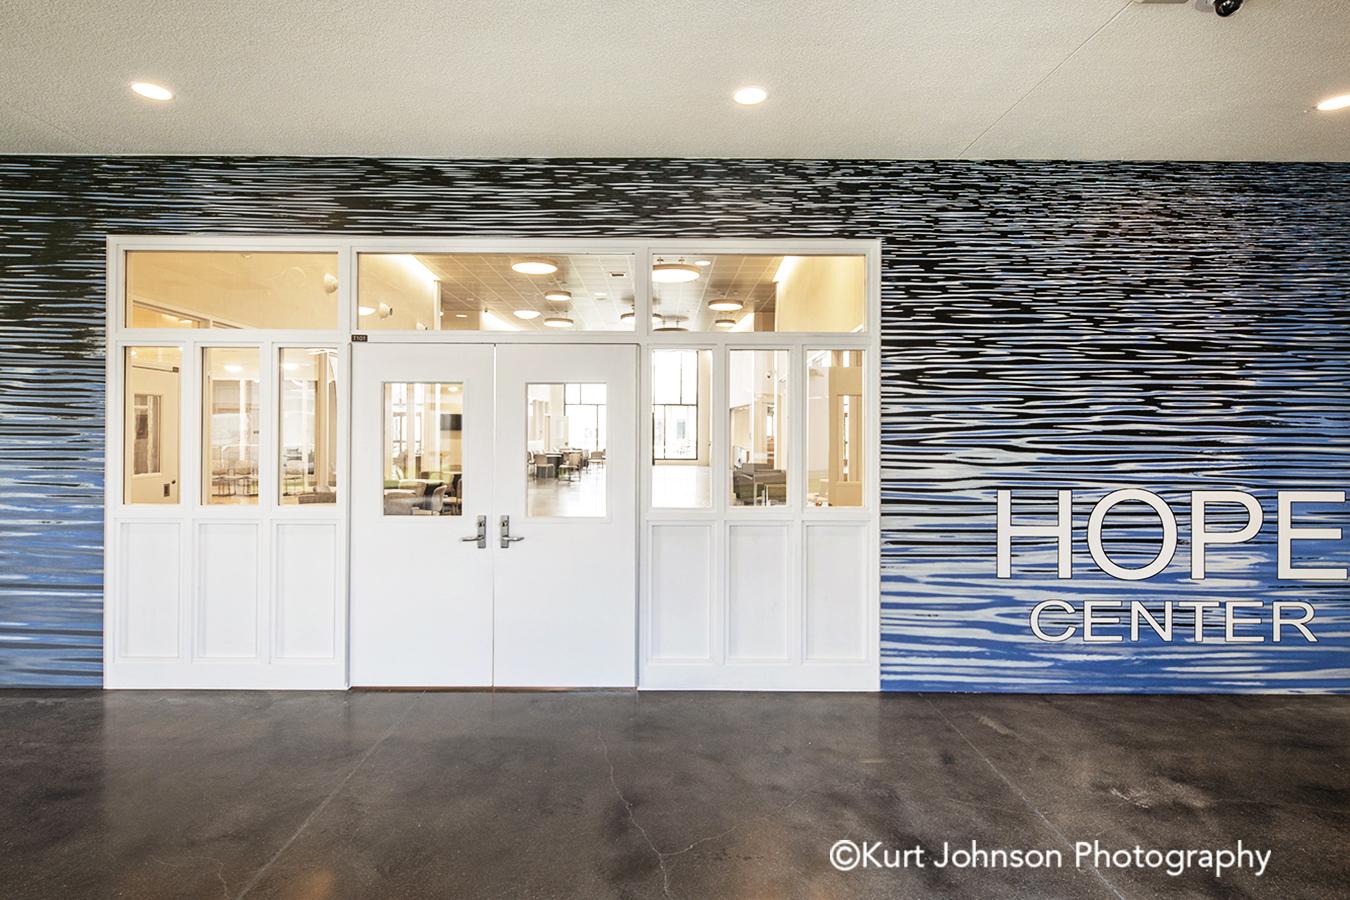 fulton state hospital missouri mo behavioral health Koroseal type II vinyl wallcovering wayfinding art install installation blue water waterscape